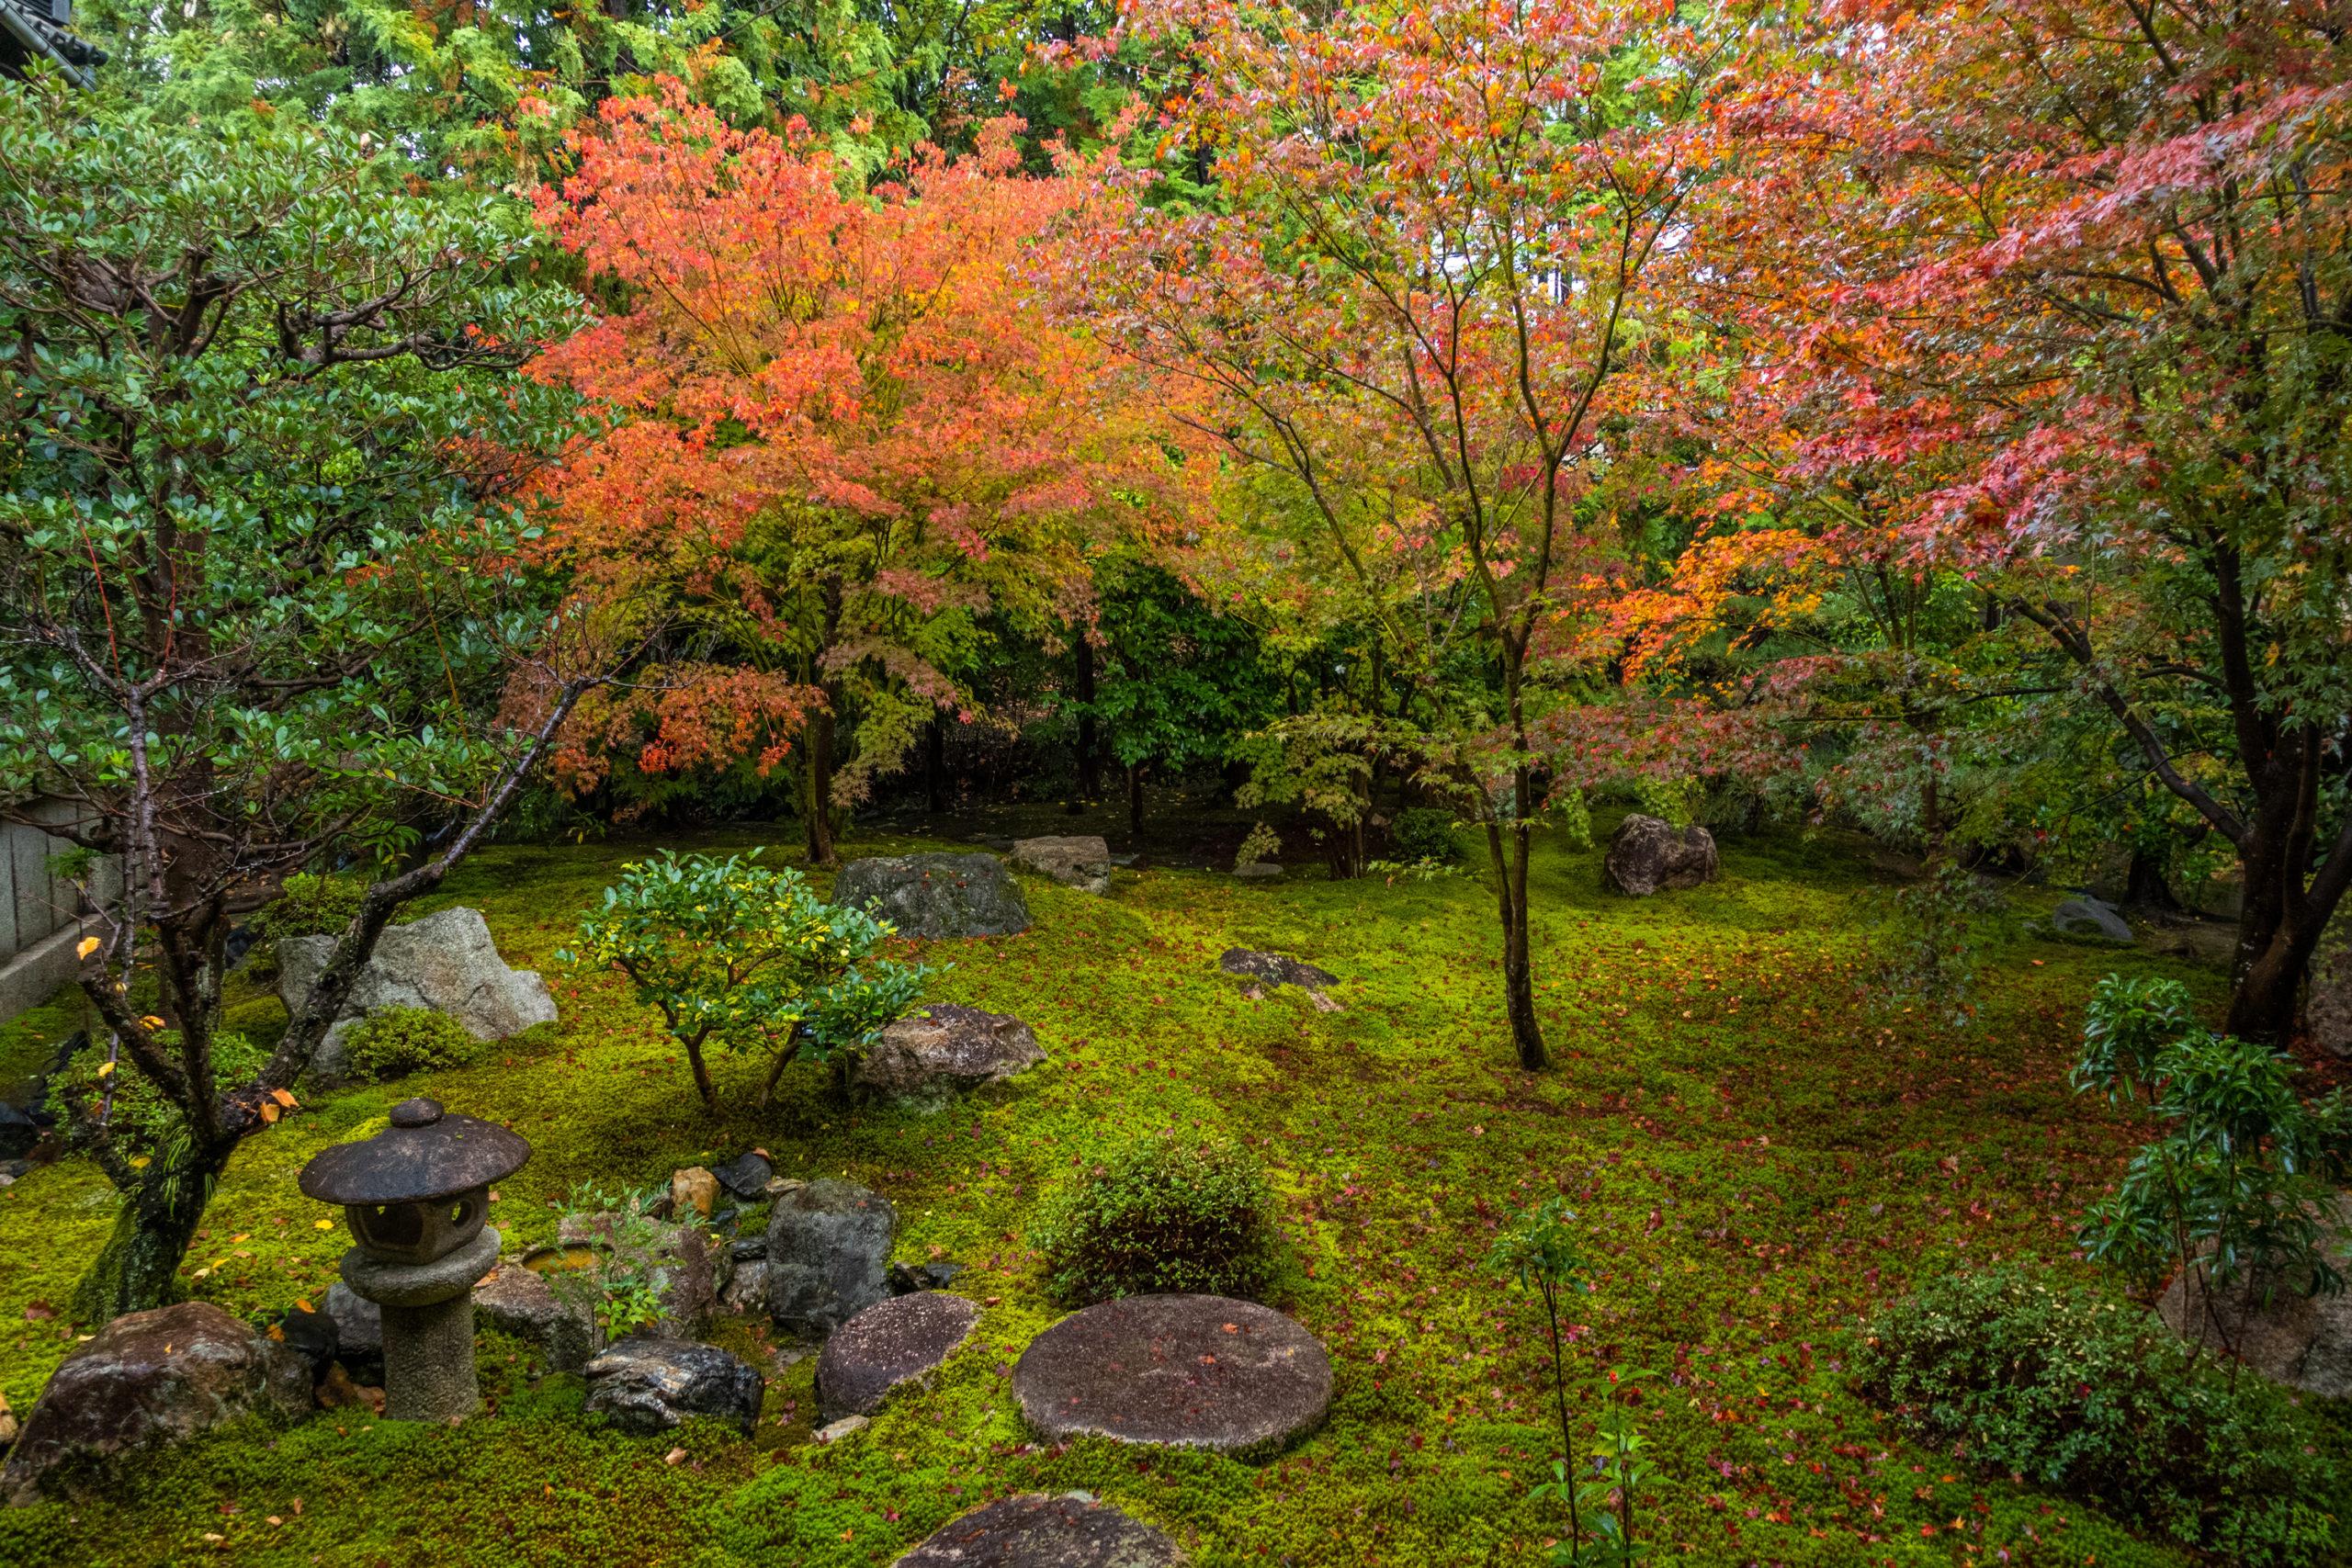 DSC00948-scaled 京都  勝林寺(紅葉と和傘の風情を感じる景色が美しい秋におすすめのスポット!撮影した写真の紹介、アクセス情報など)